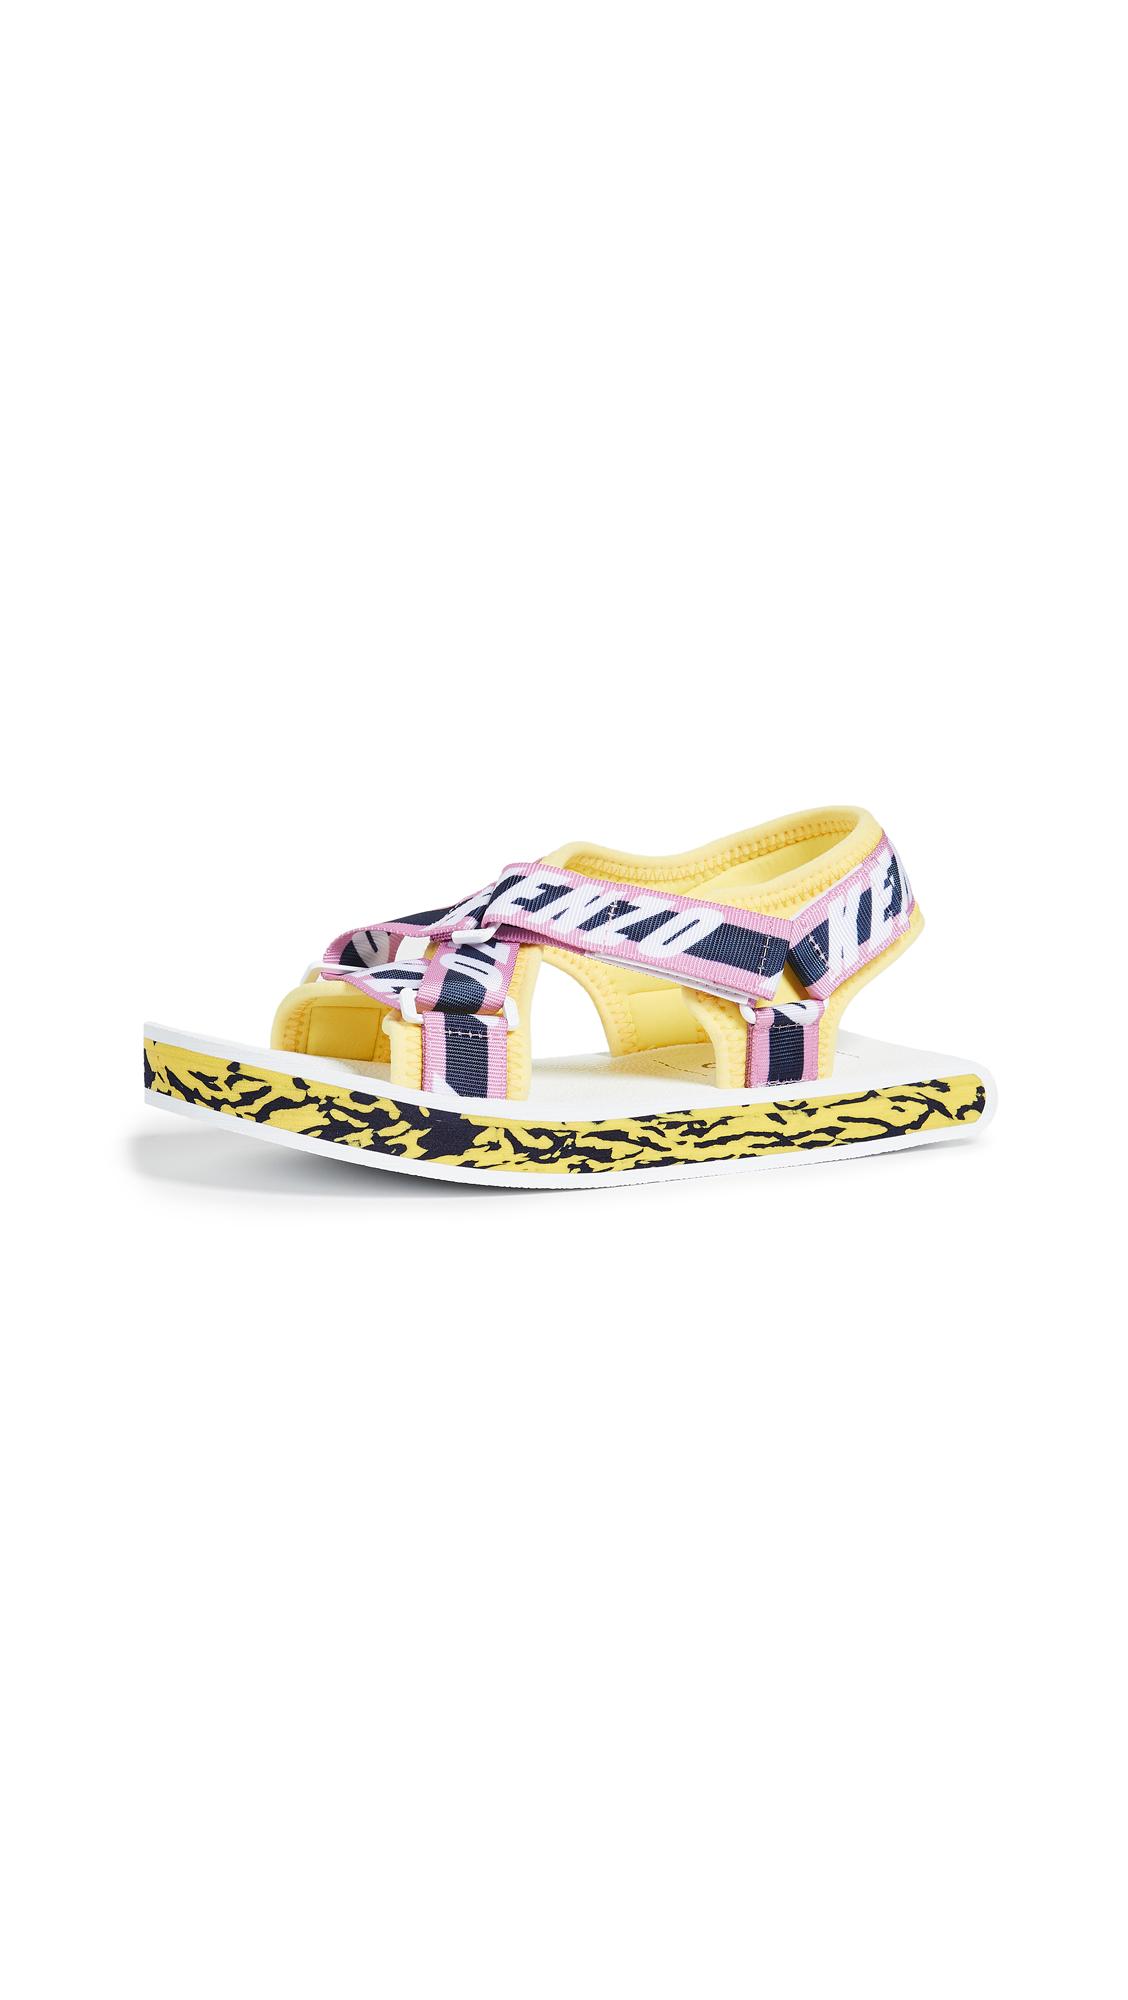 KENZO Lynn Flat Sandals - Pastel Pink